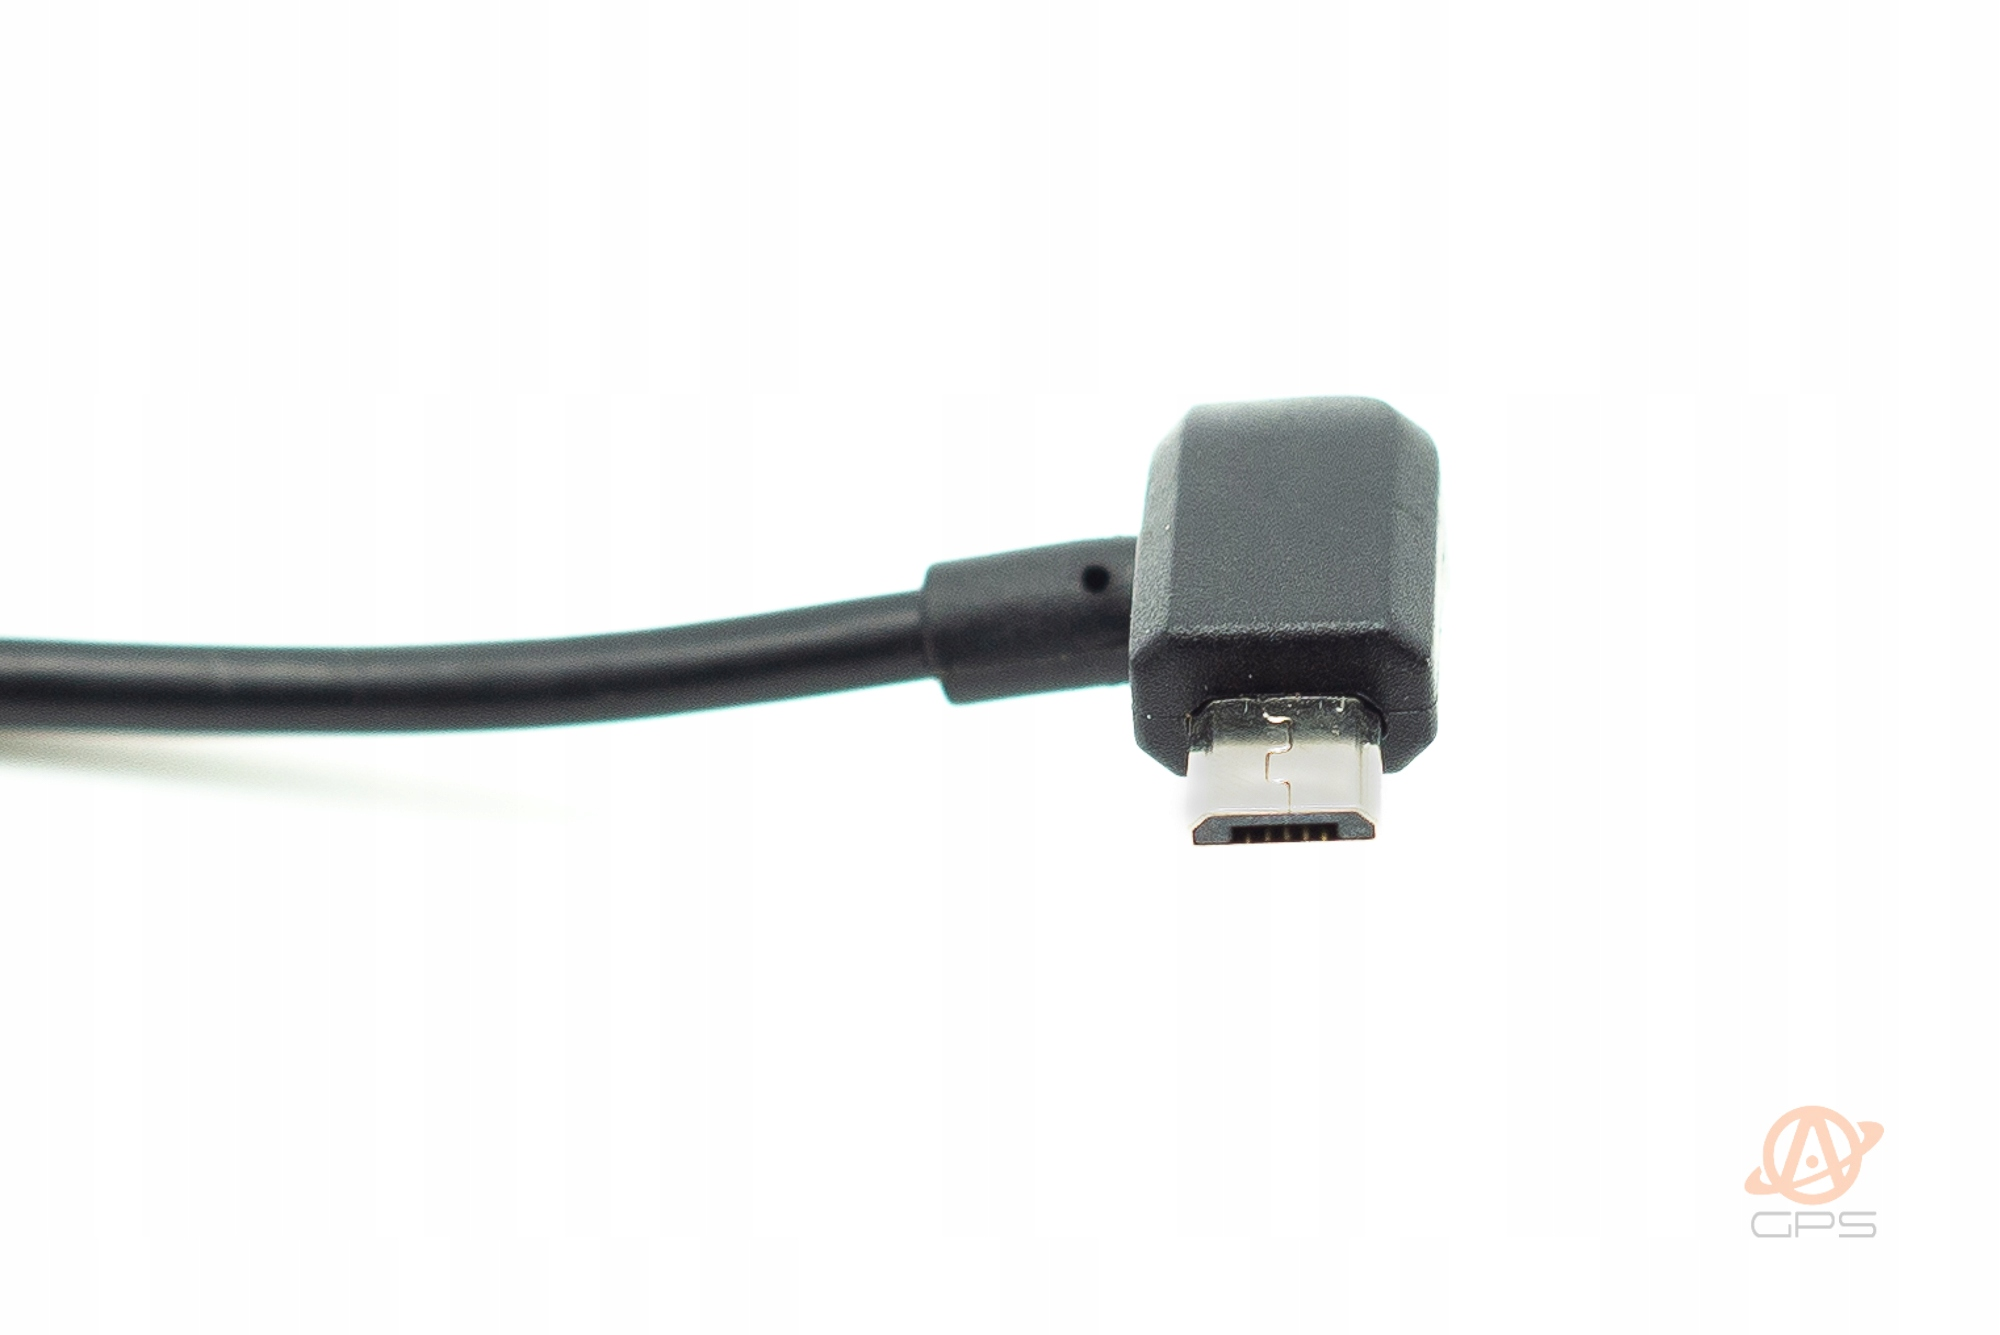 ŁADOWARKA SAMOCHODOWA Z FILTREM MICRO USB 5V 2.5A Producent ALGA